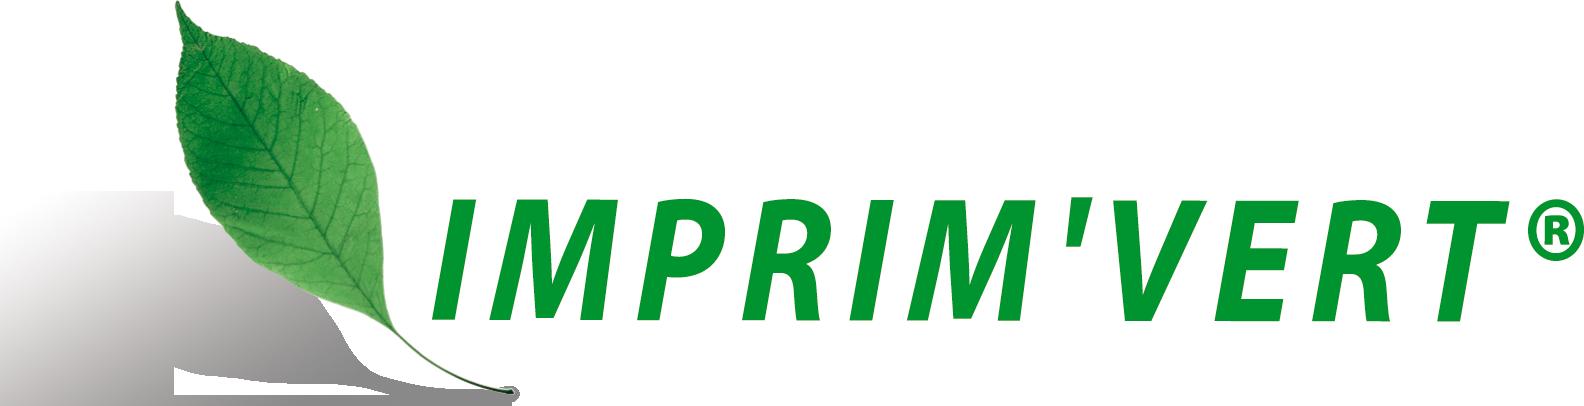 influence_concept_imprim_vert